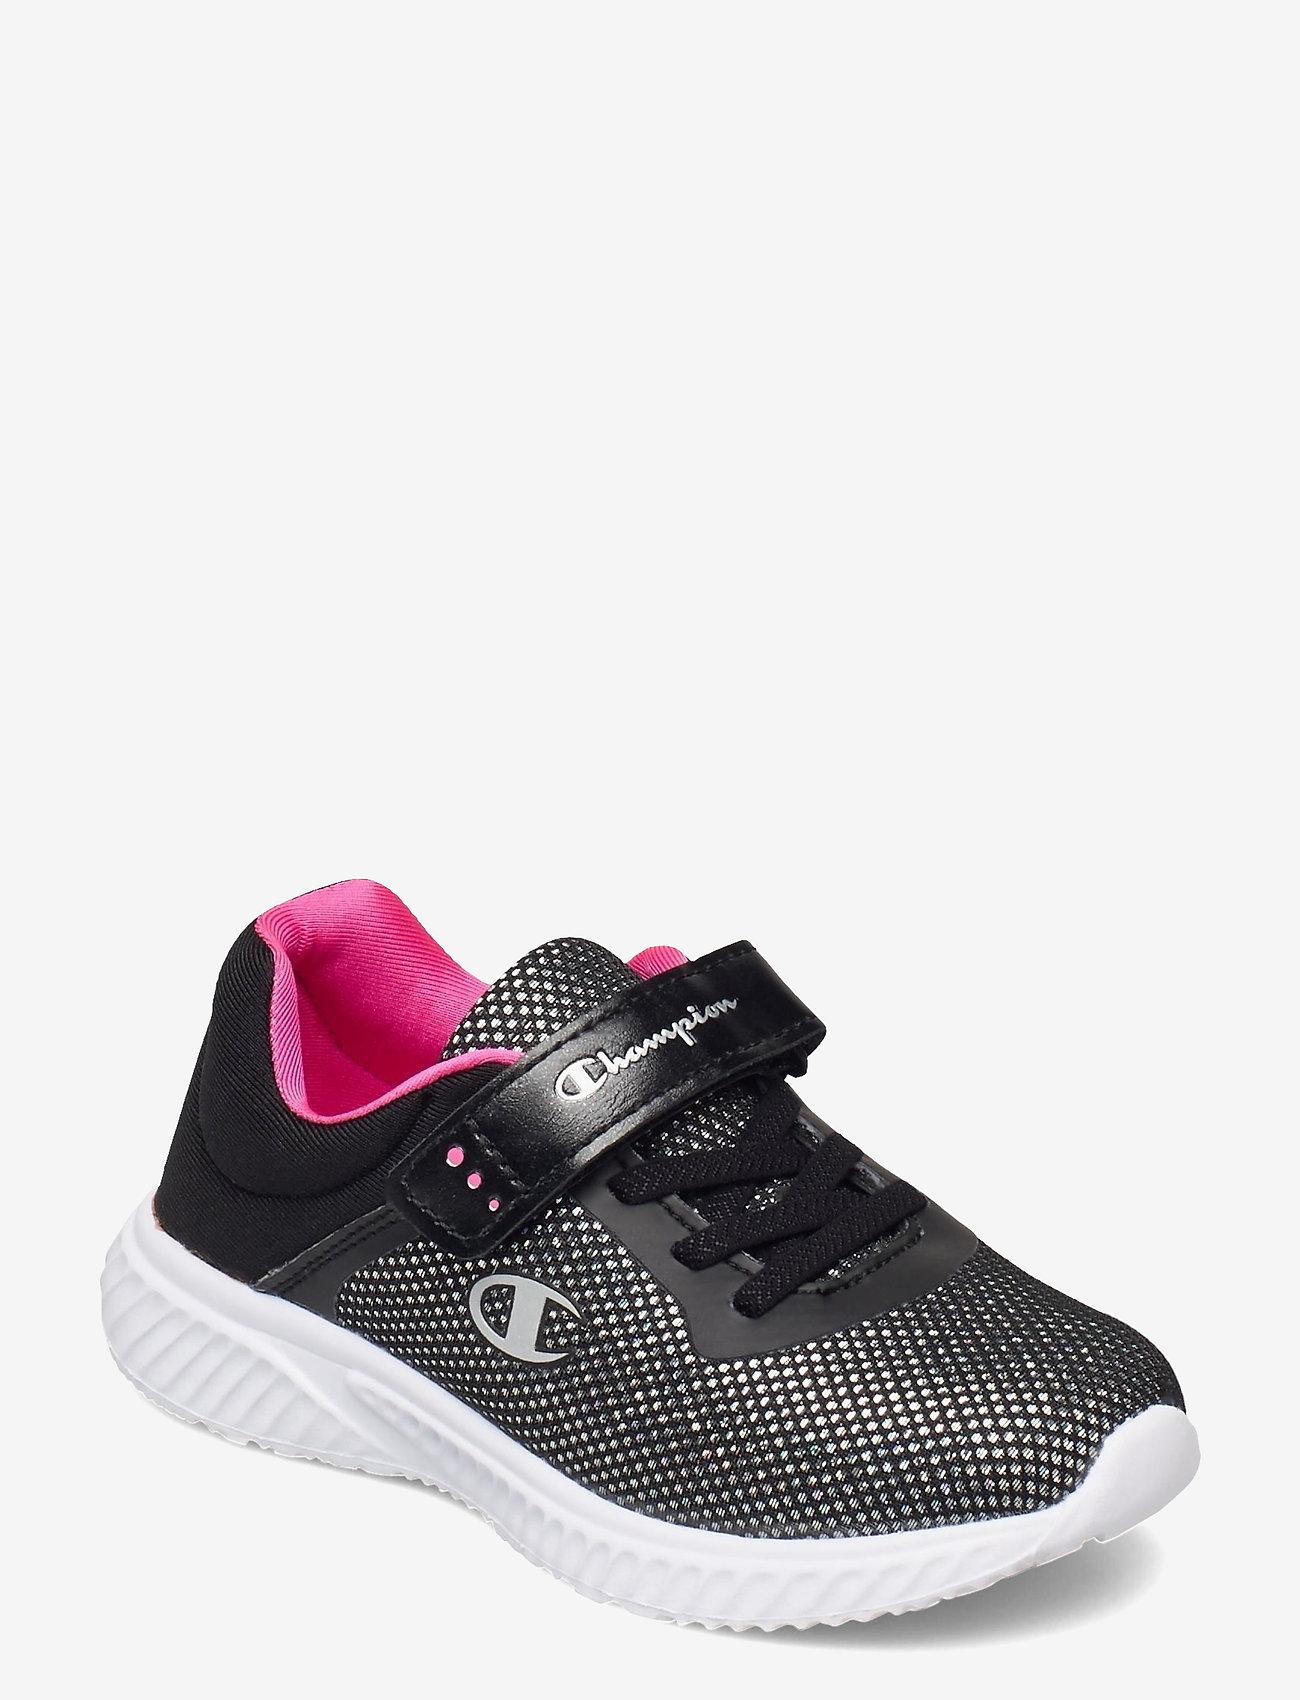 Champion - Low Cut Shoe SOFTY 2.0 G PS - niedriger schnitt - black beauty - 0